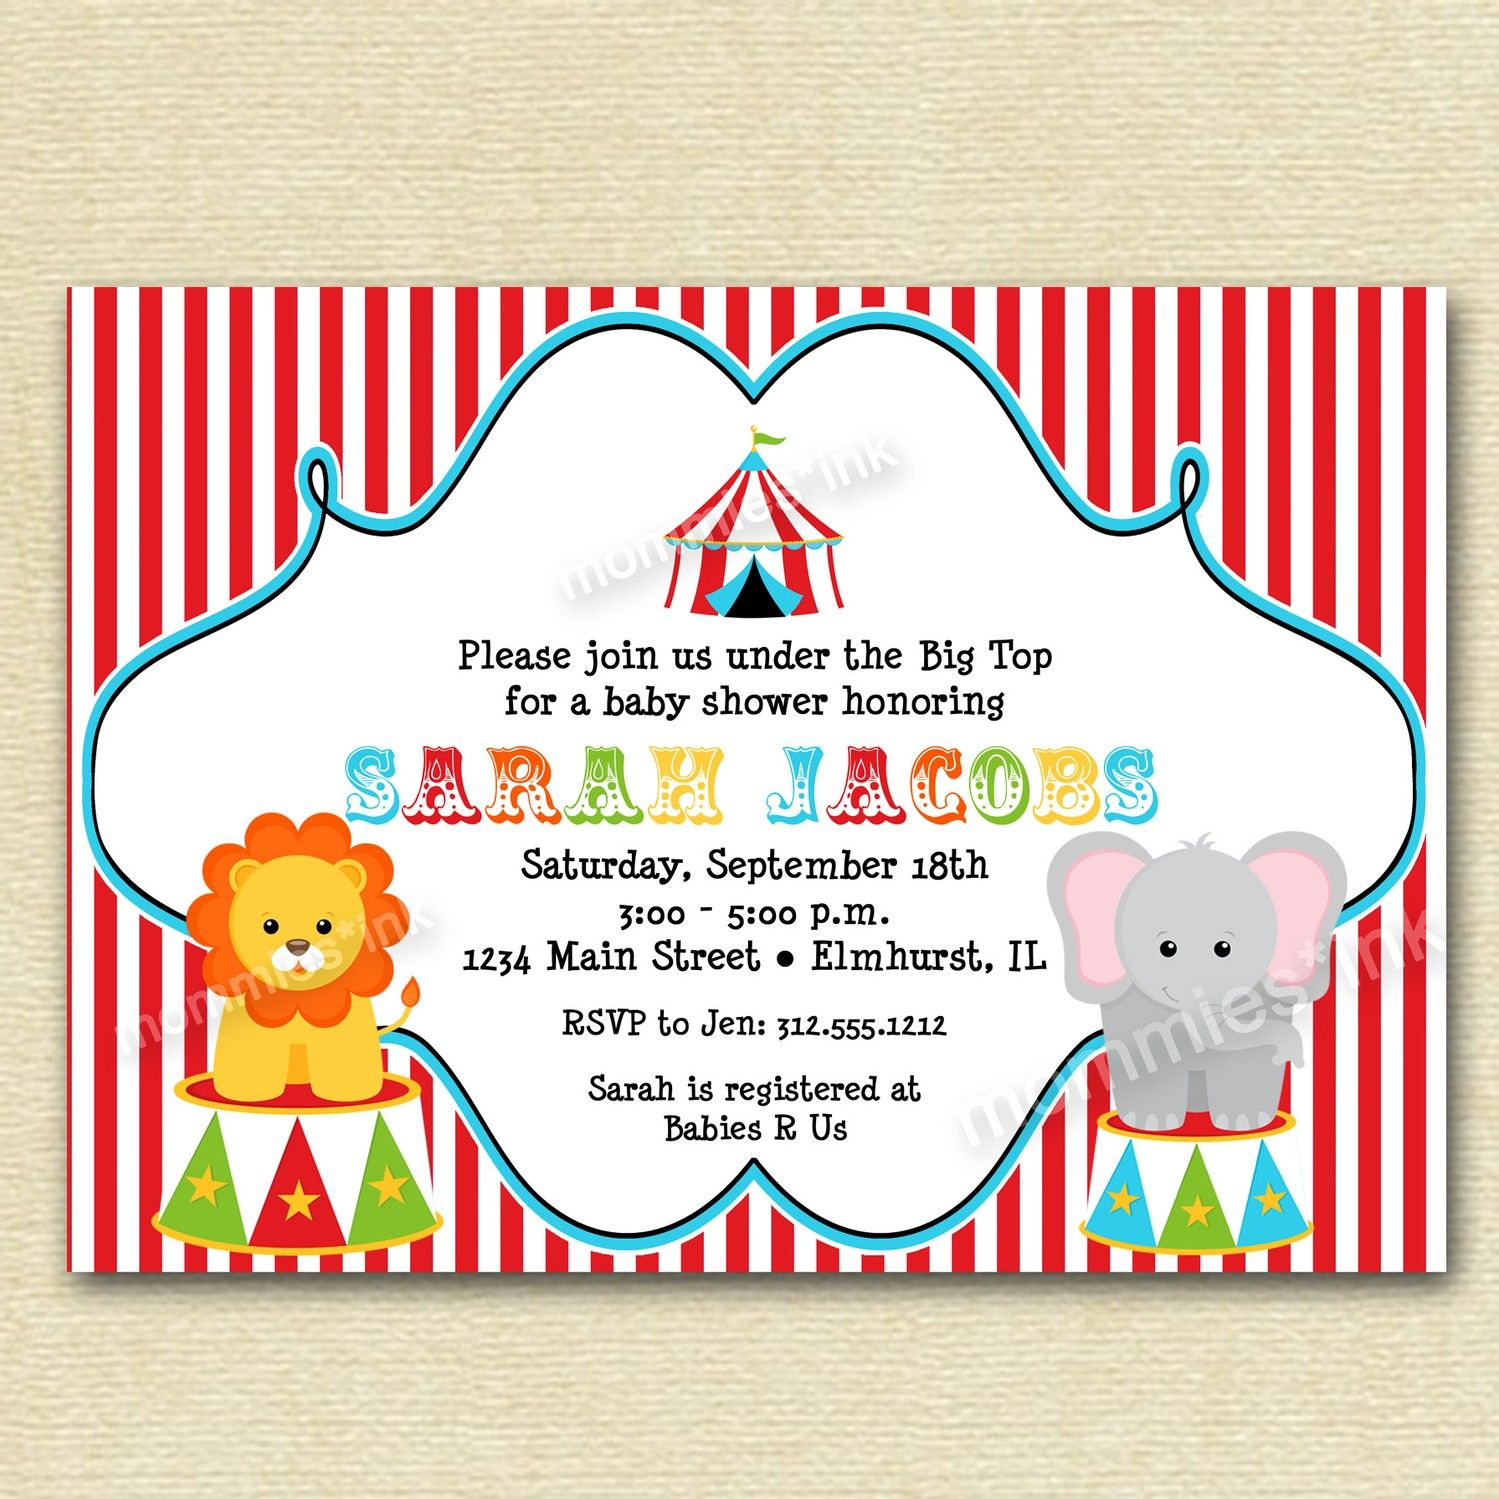 Circus Big Top Baby Shower Invitation PRINTABLE INVITATION